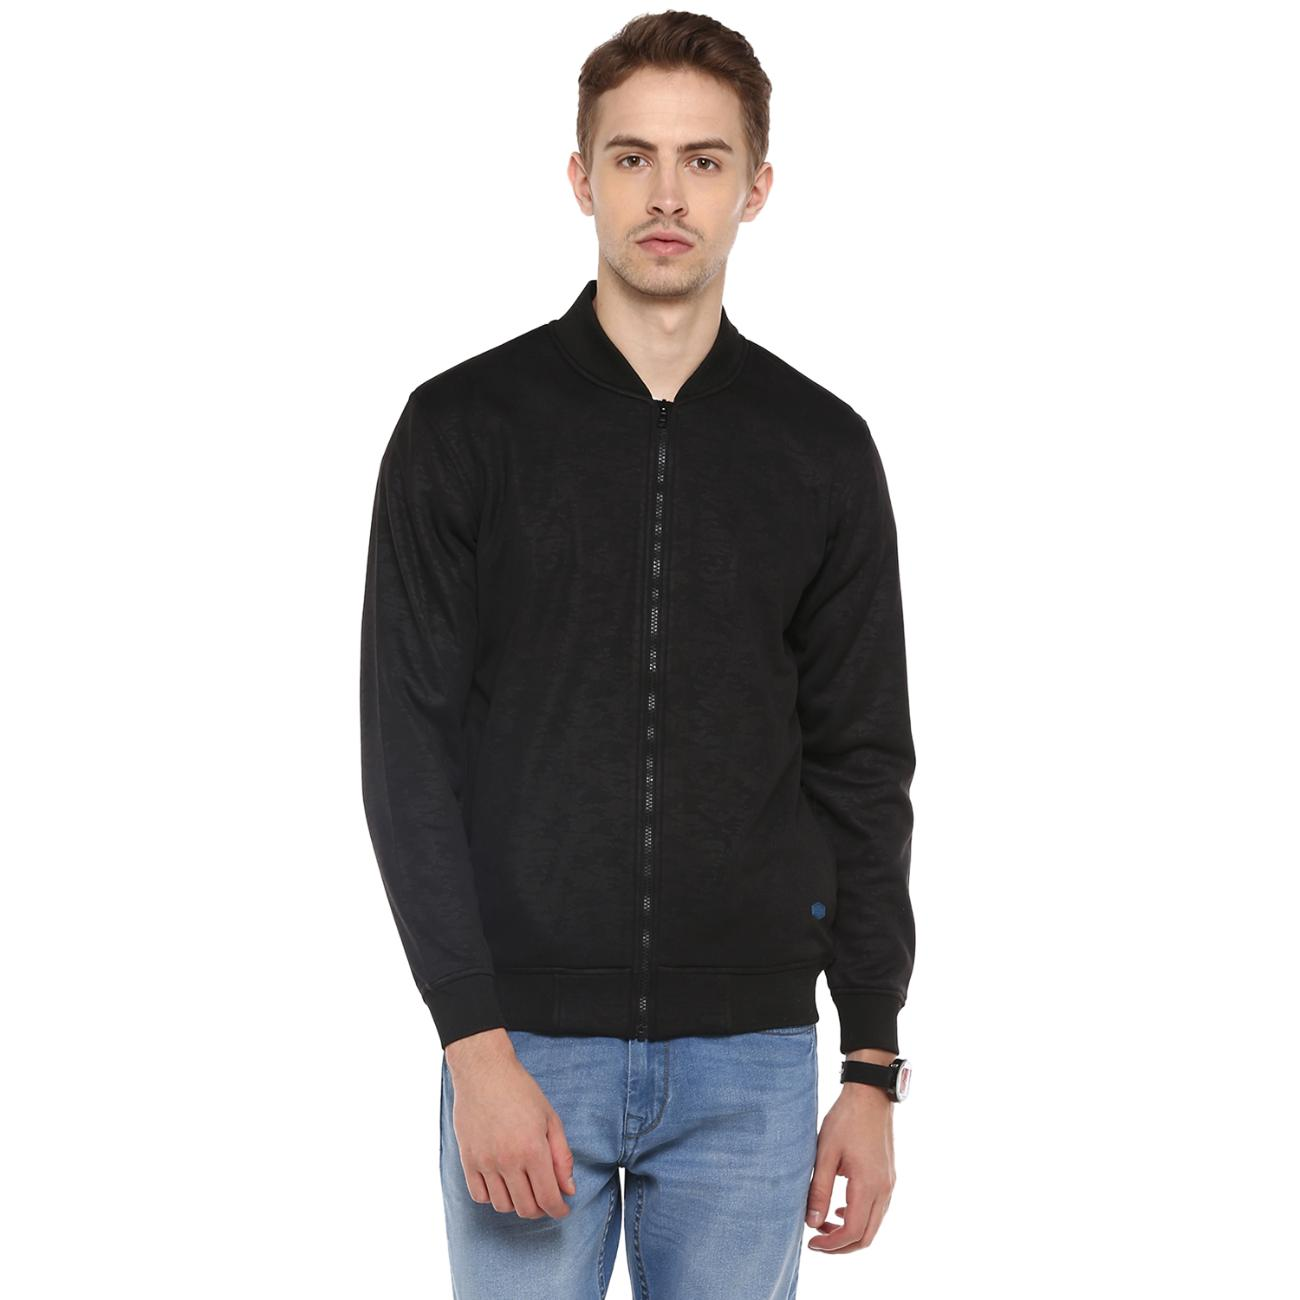 Buy Men's Black Bomber Jacket